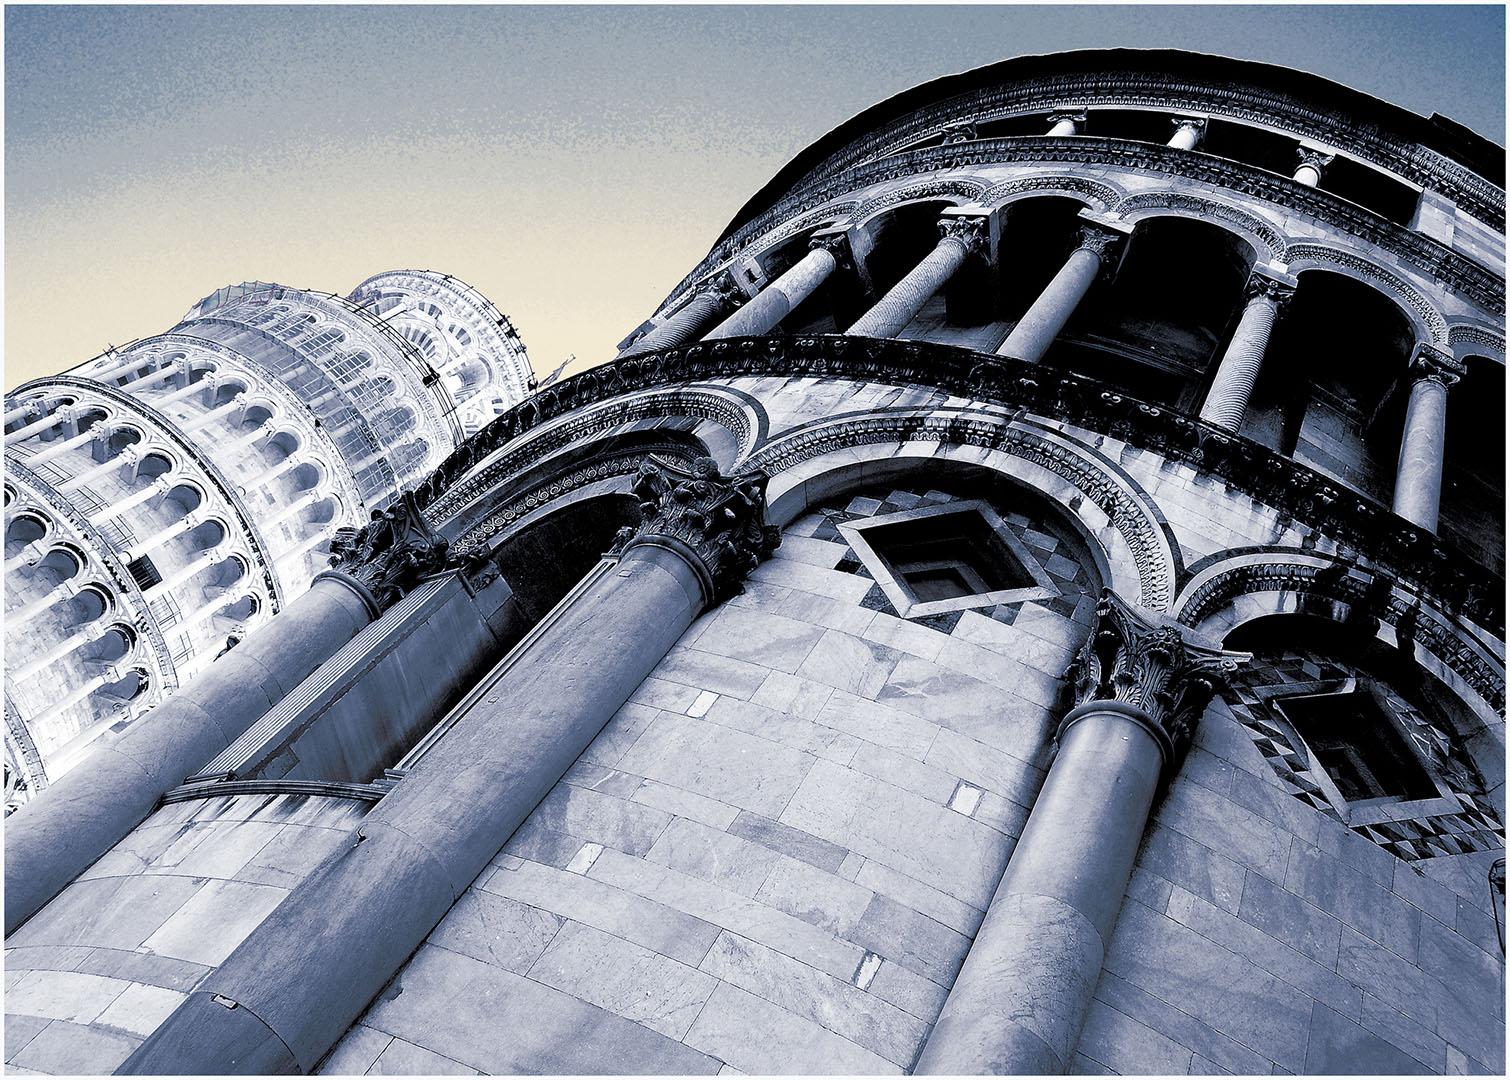 Pisa-Piazza_dei_Miracoli_047_I08-10.77